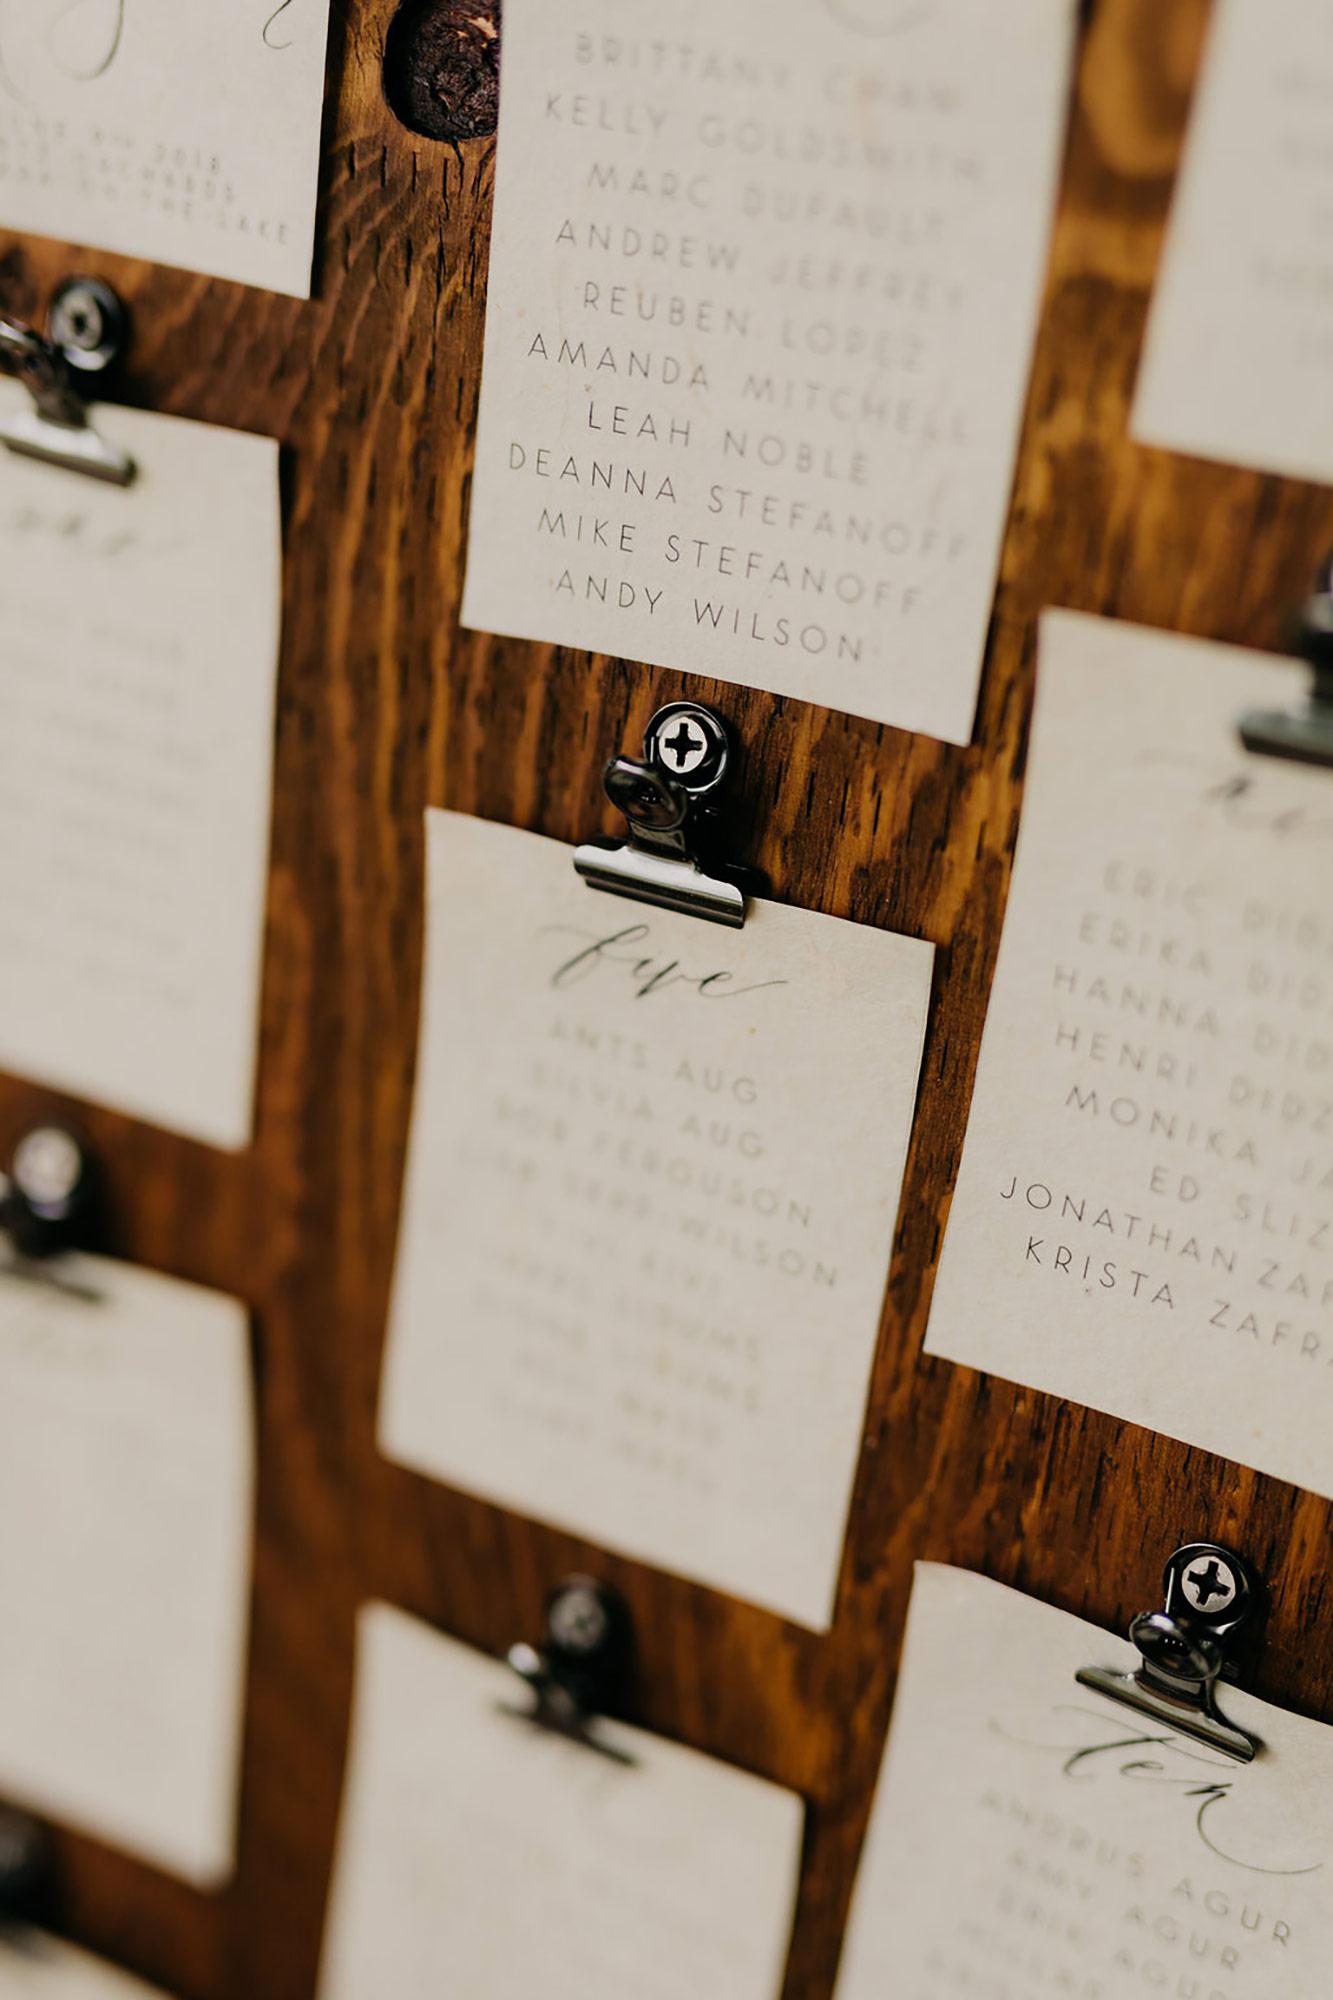 Kurtz-Orchards-Wedding-Niagara-wedding-Vineyard-Bride-Photography-by-Kayla-Rocca-045.JPG